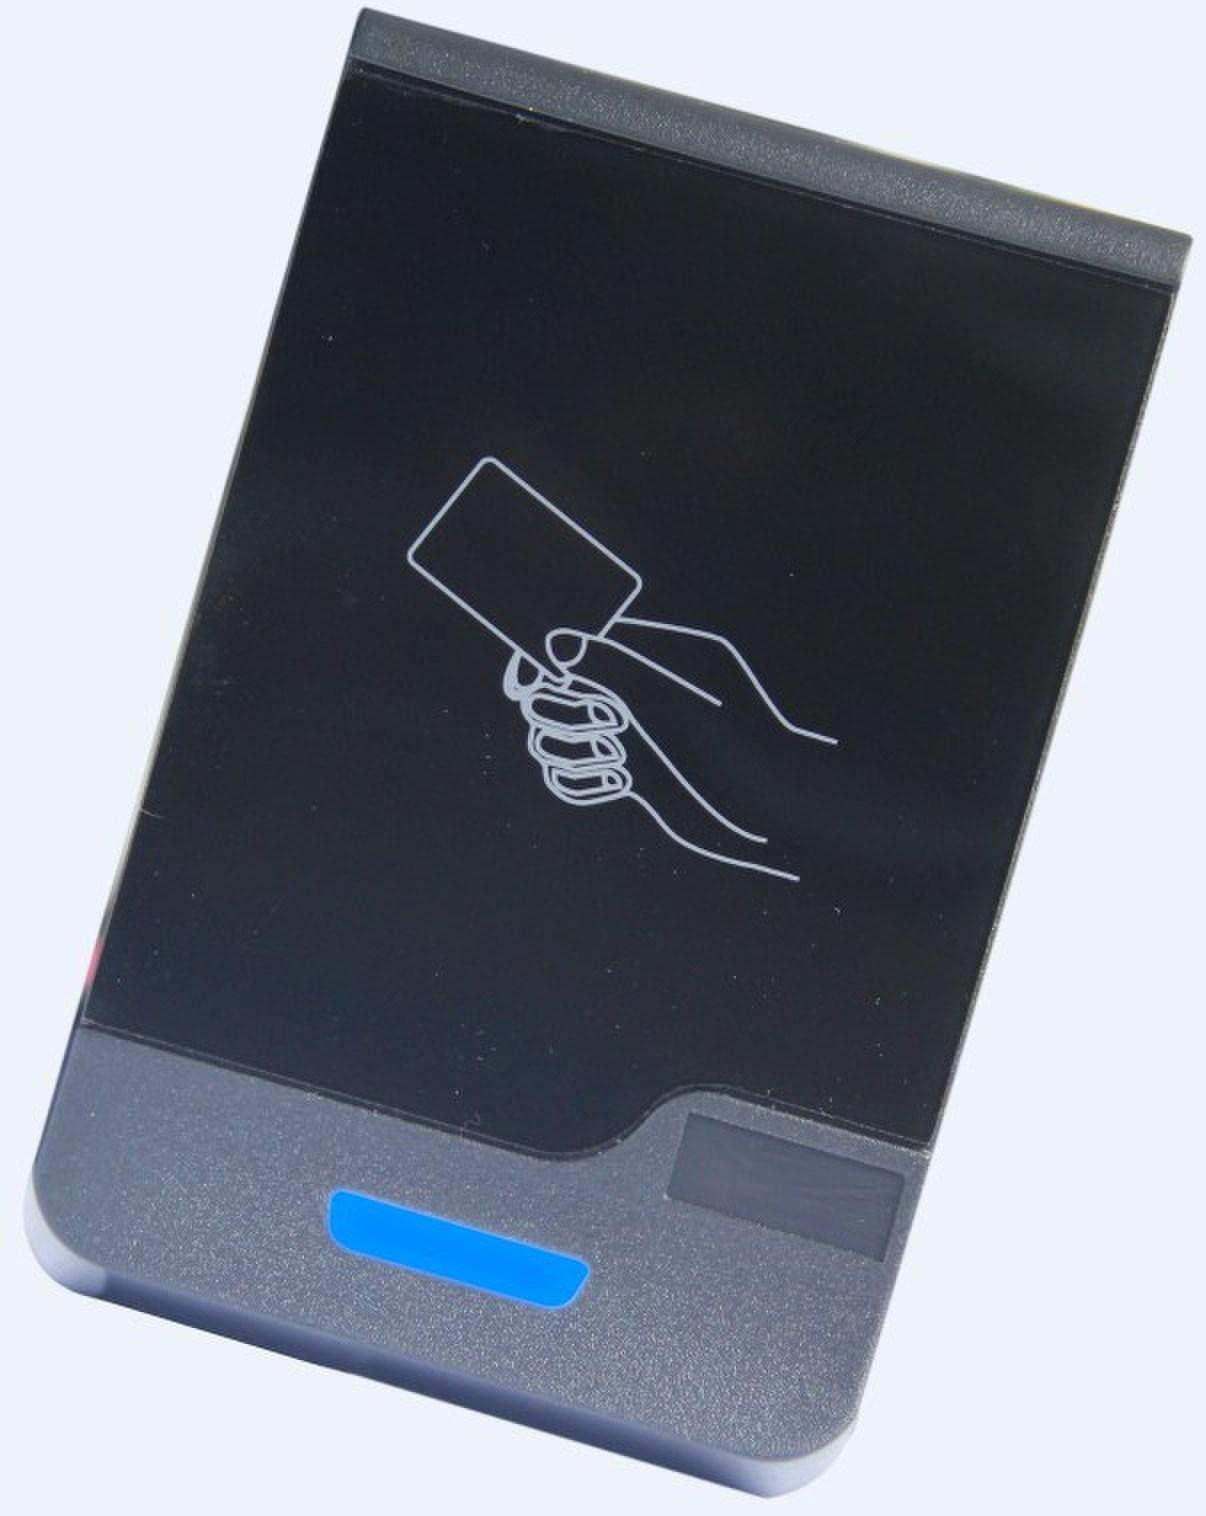 13.56MHz ISO14443A Hf RFID Reader Module Access Control Card Reader